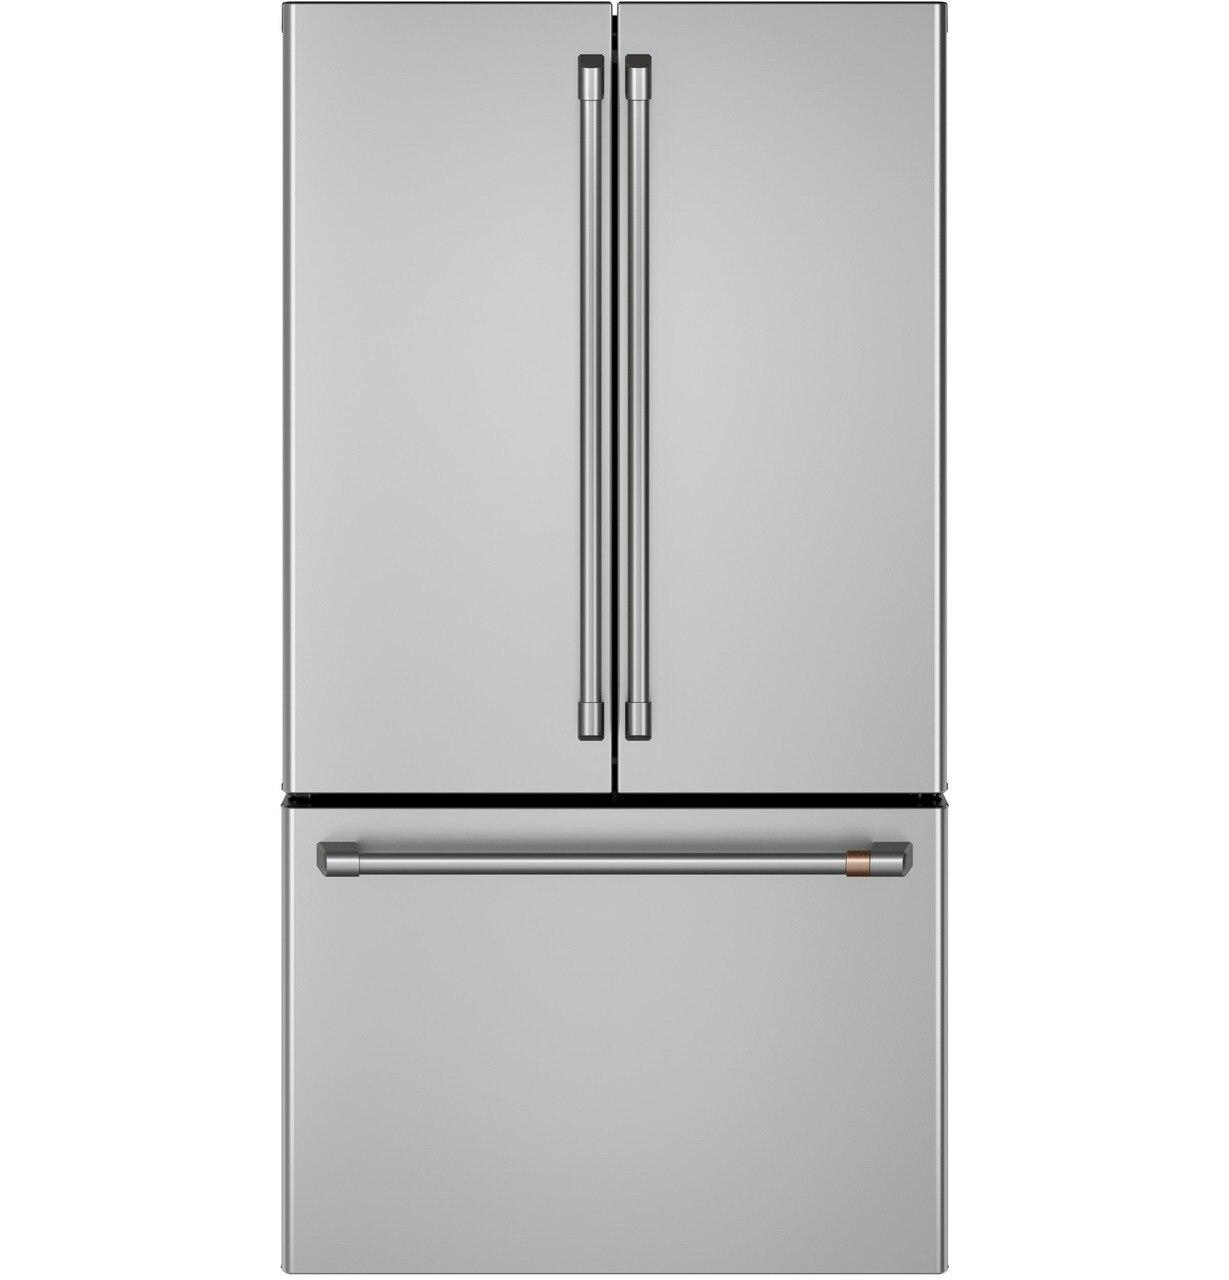 Cafe AppliancesCafe™ Energy Star® 23.1 Cu. Ft. Smart Counter-Depth French-Door Refrigerator